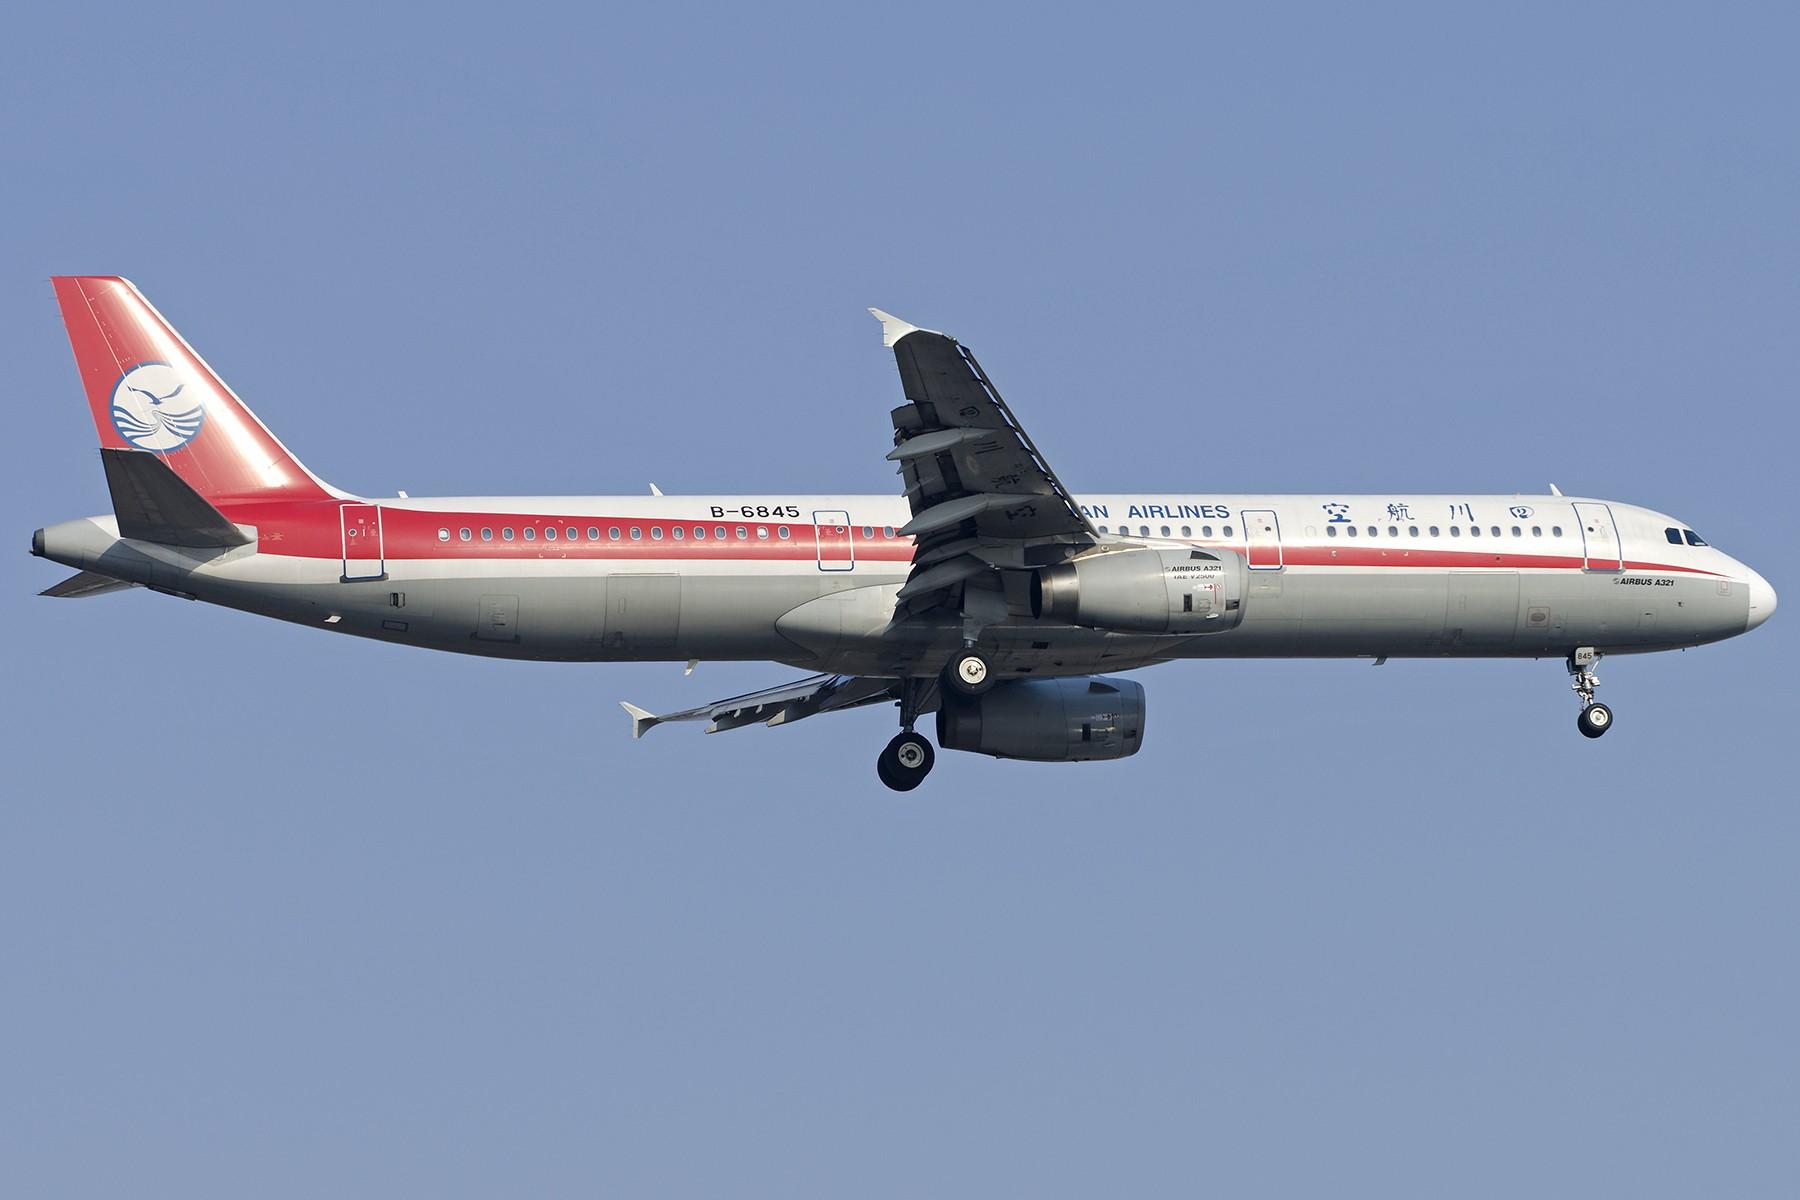 Re:[原创][原创]【PVG】好久没发图了,一堆库存(2)午后 AIRBUS A321-200 B-6845 中国上海浦东国际机场